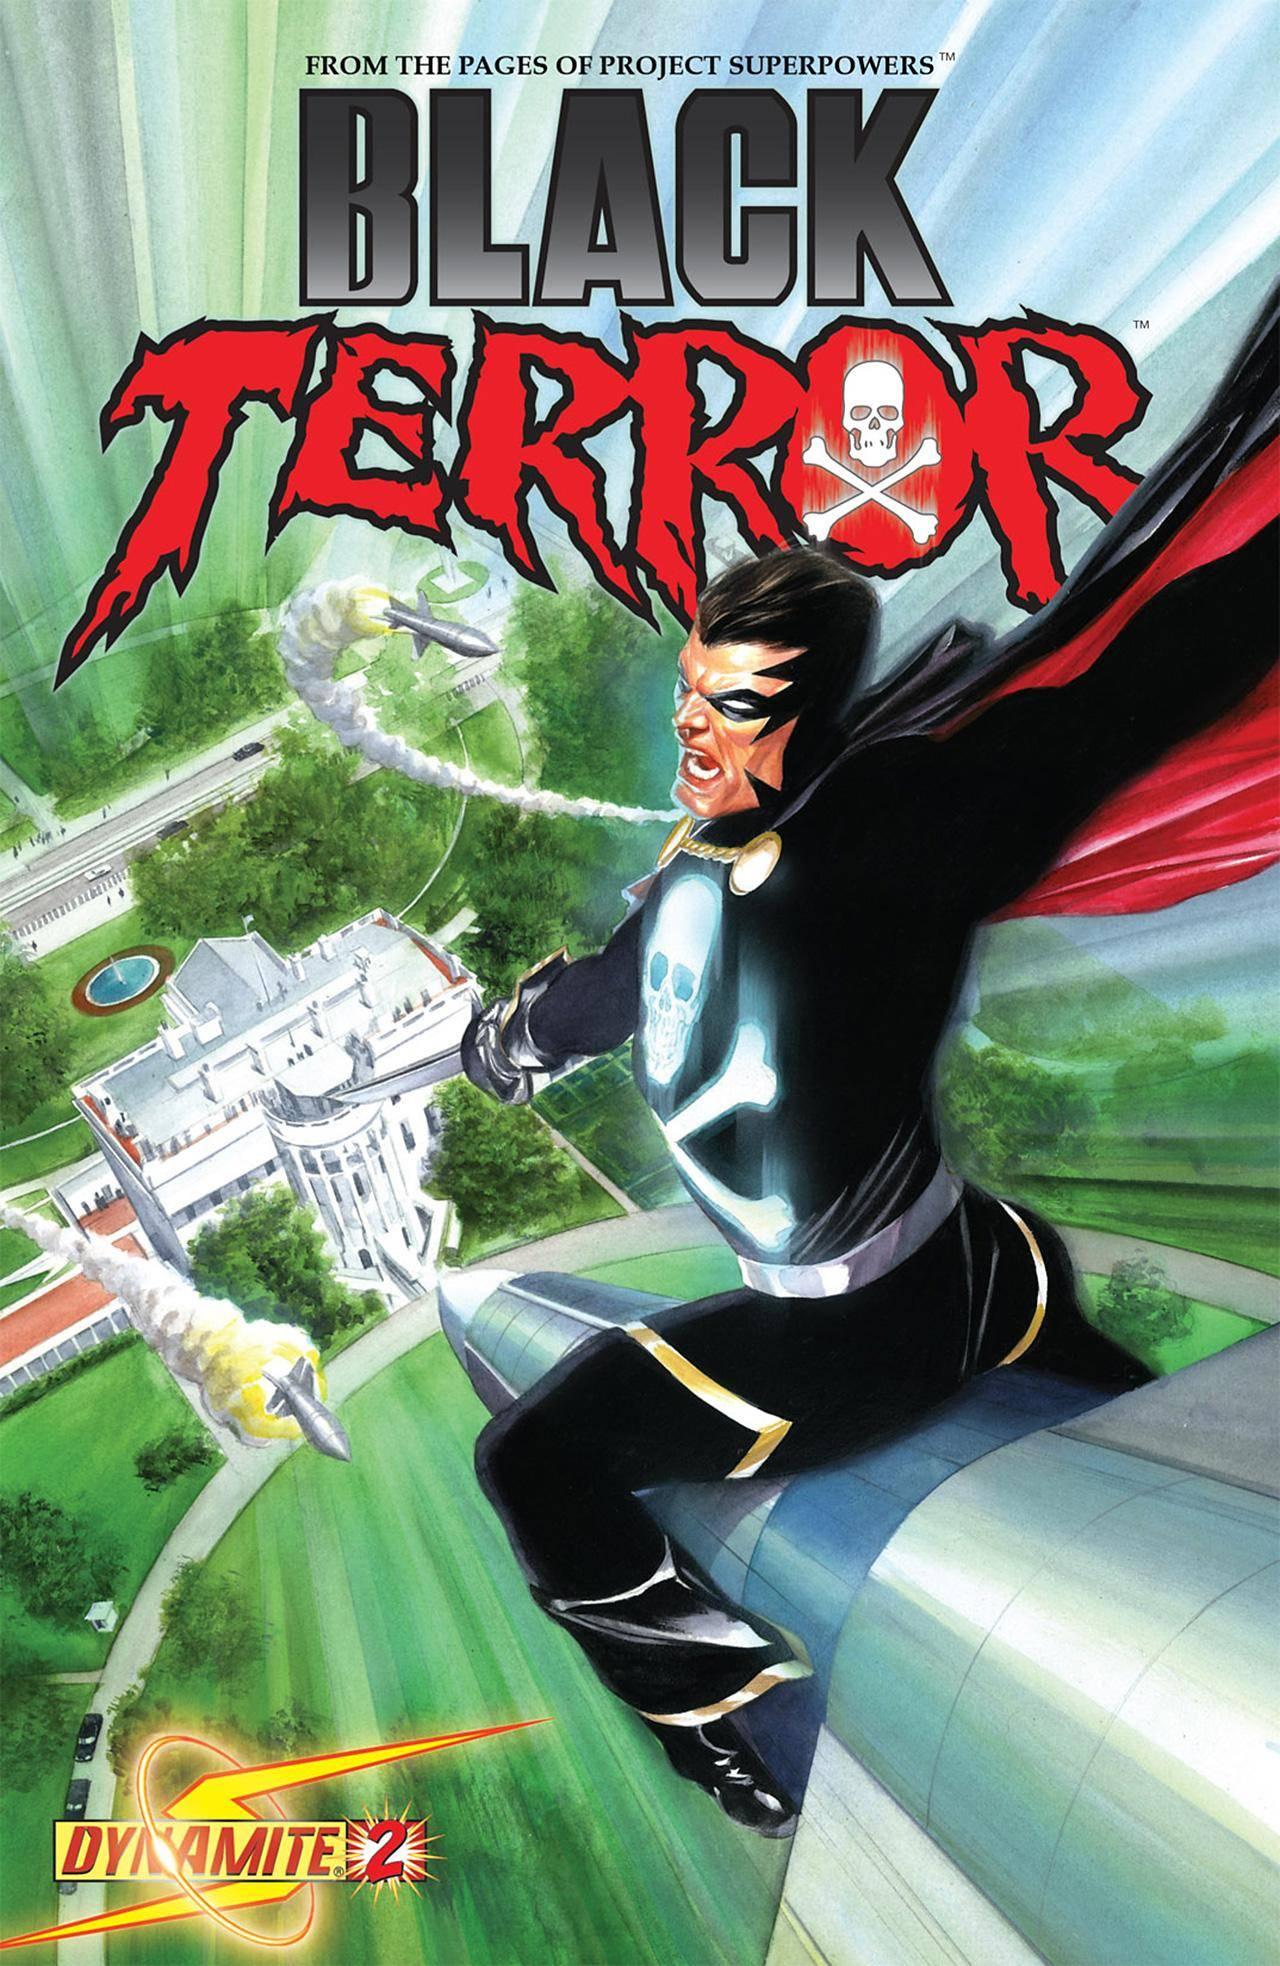 Black Terror 02 2008 digital